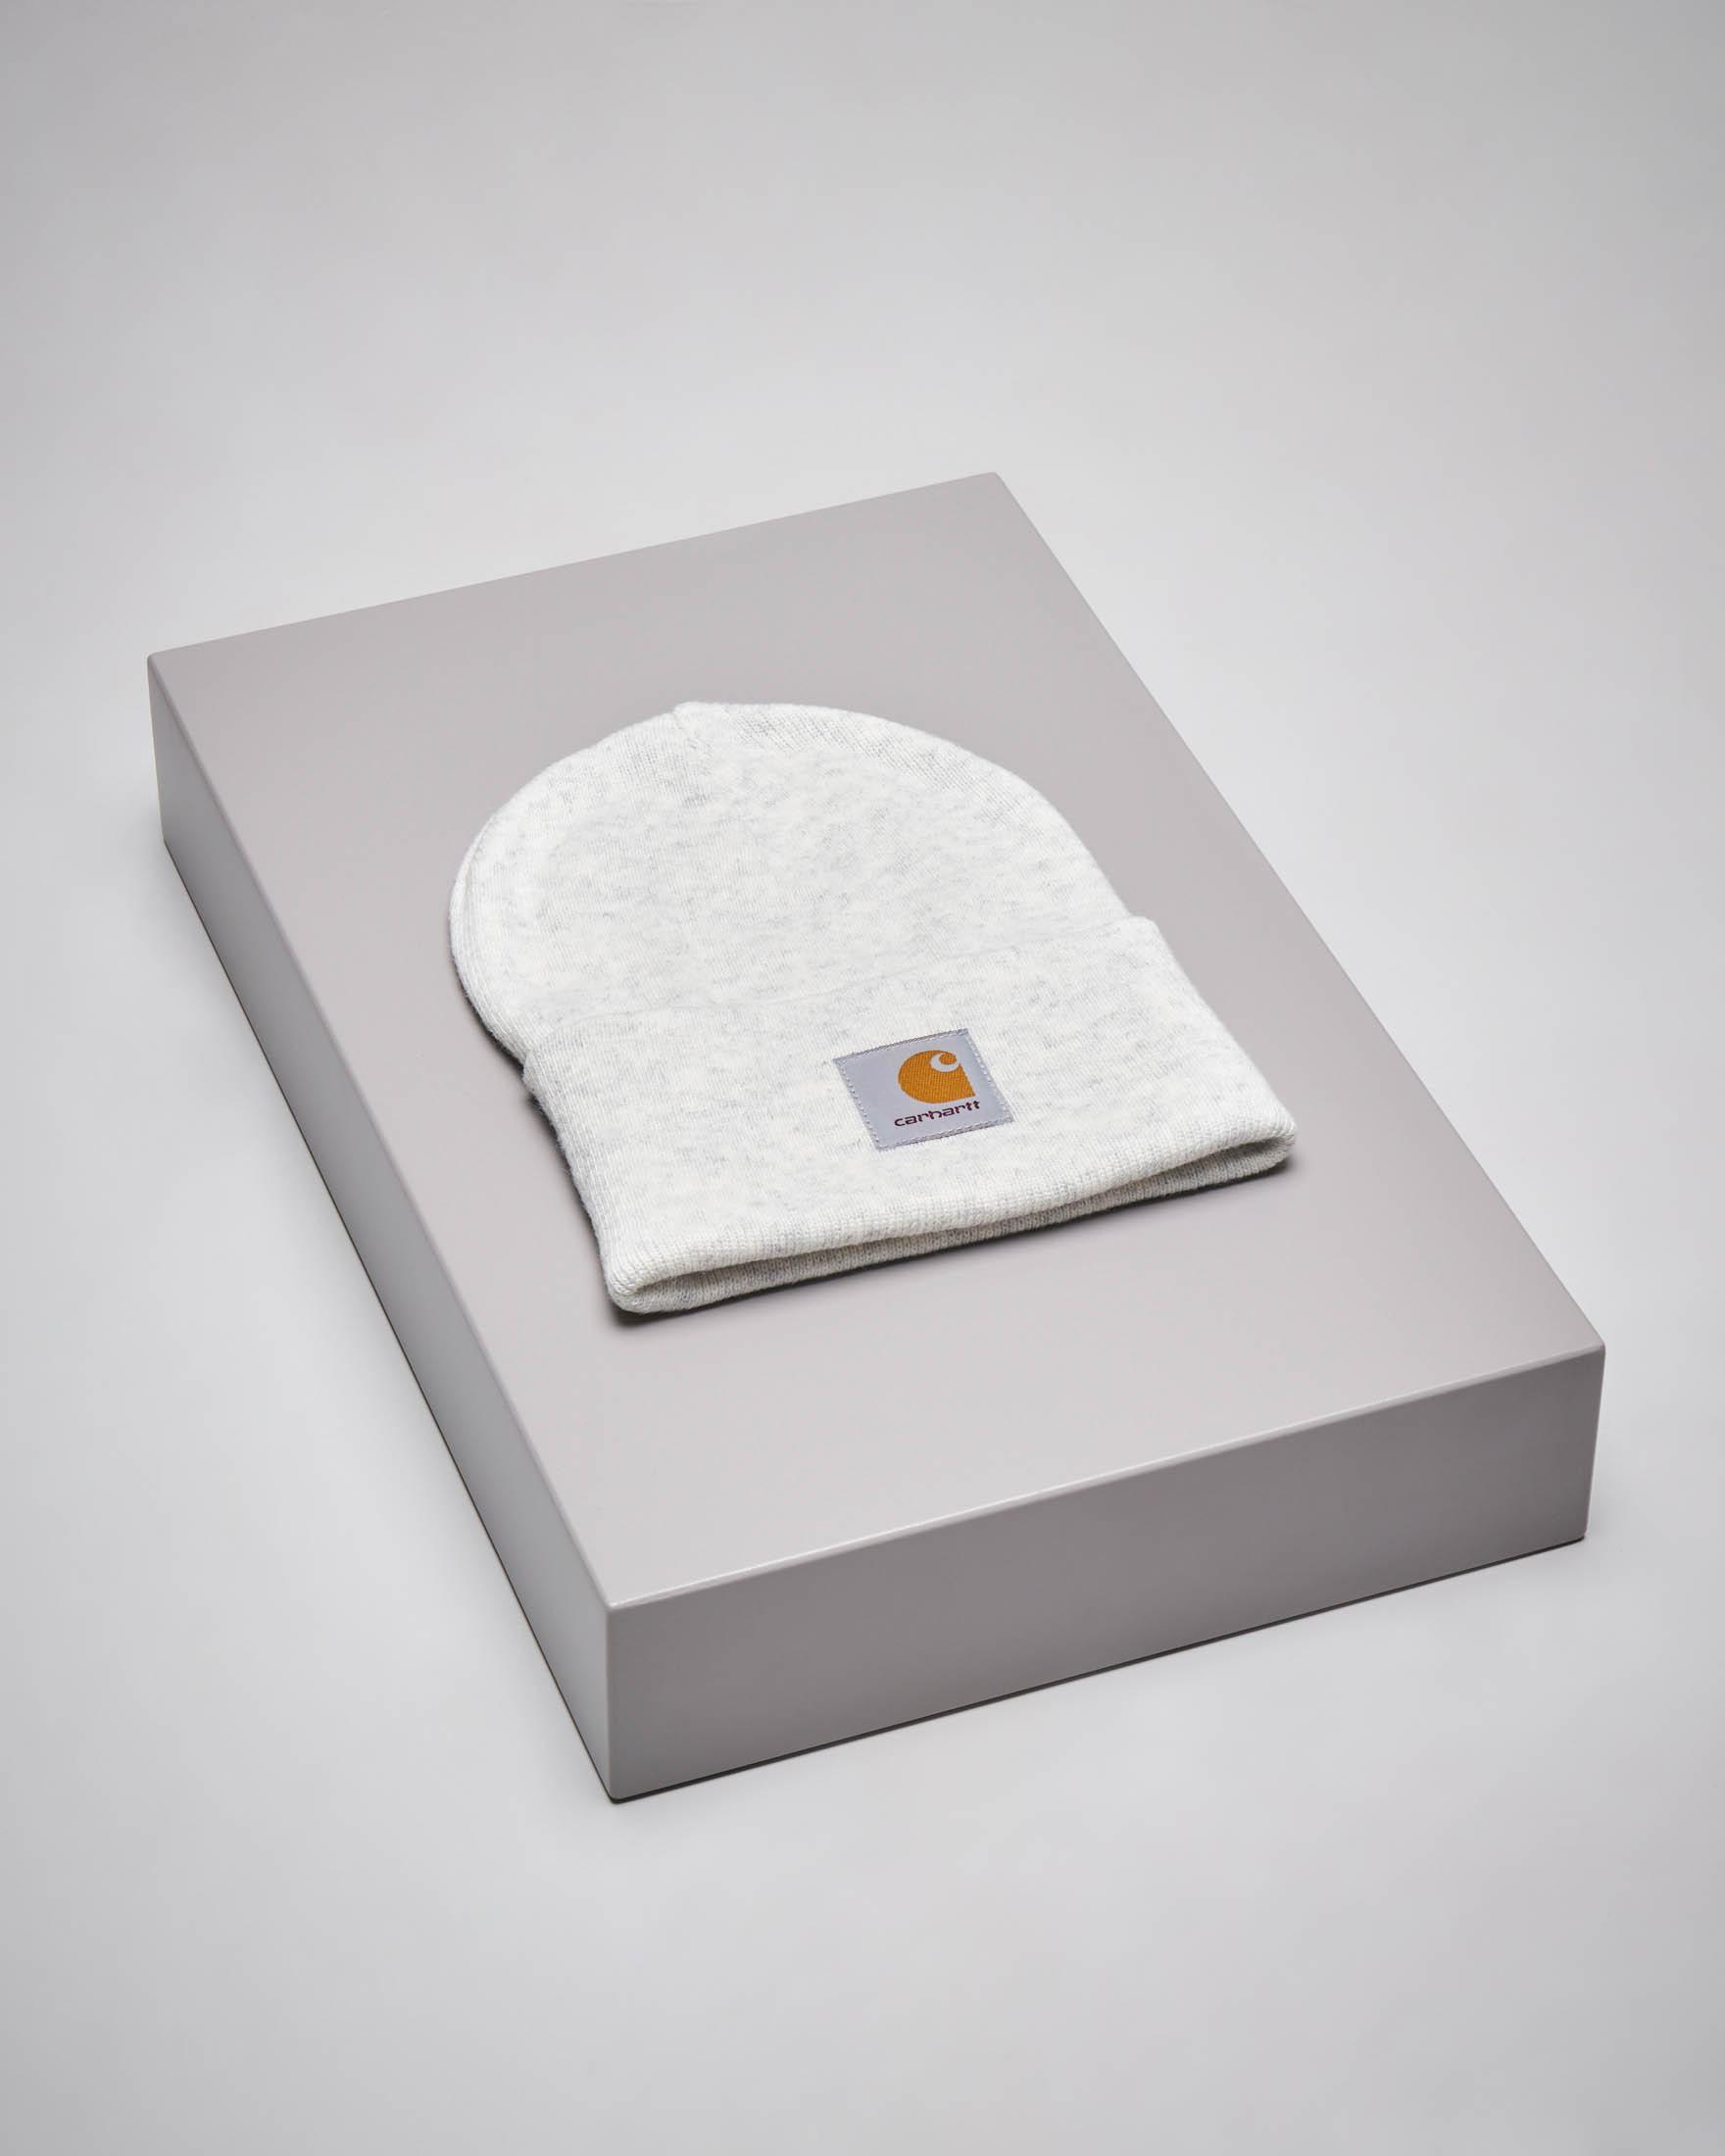 Berretto Acrylic Watch Hat bianco melange con logo